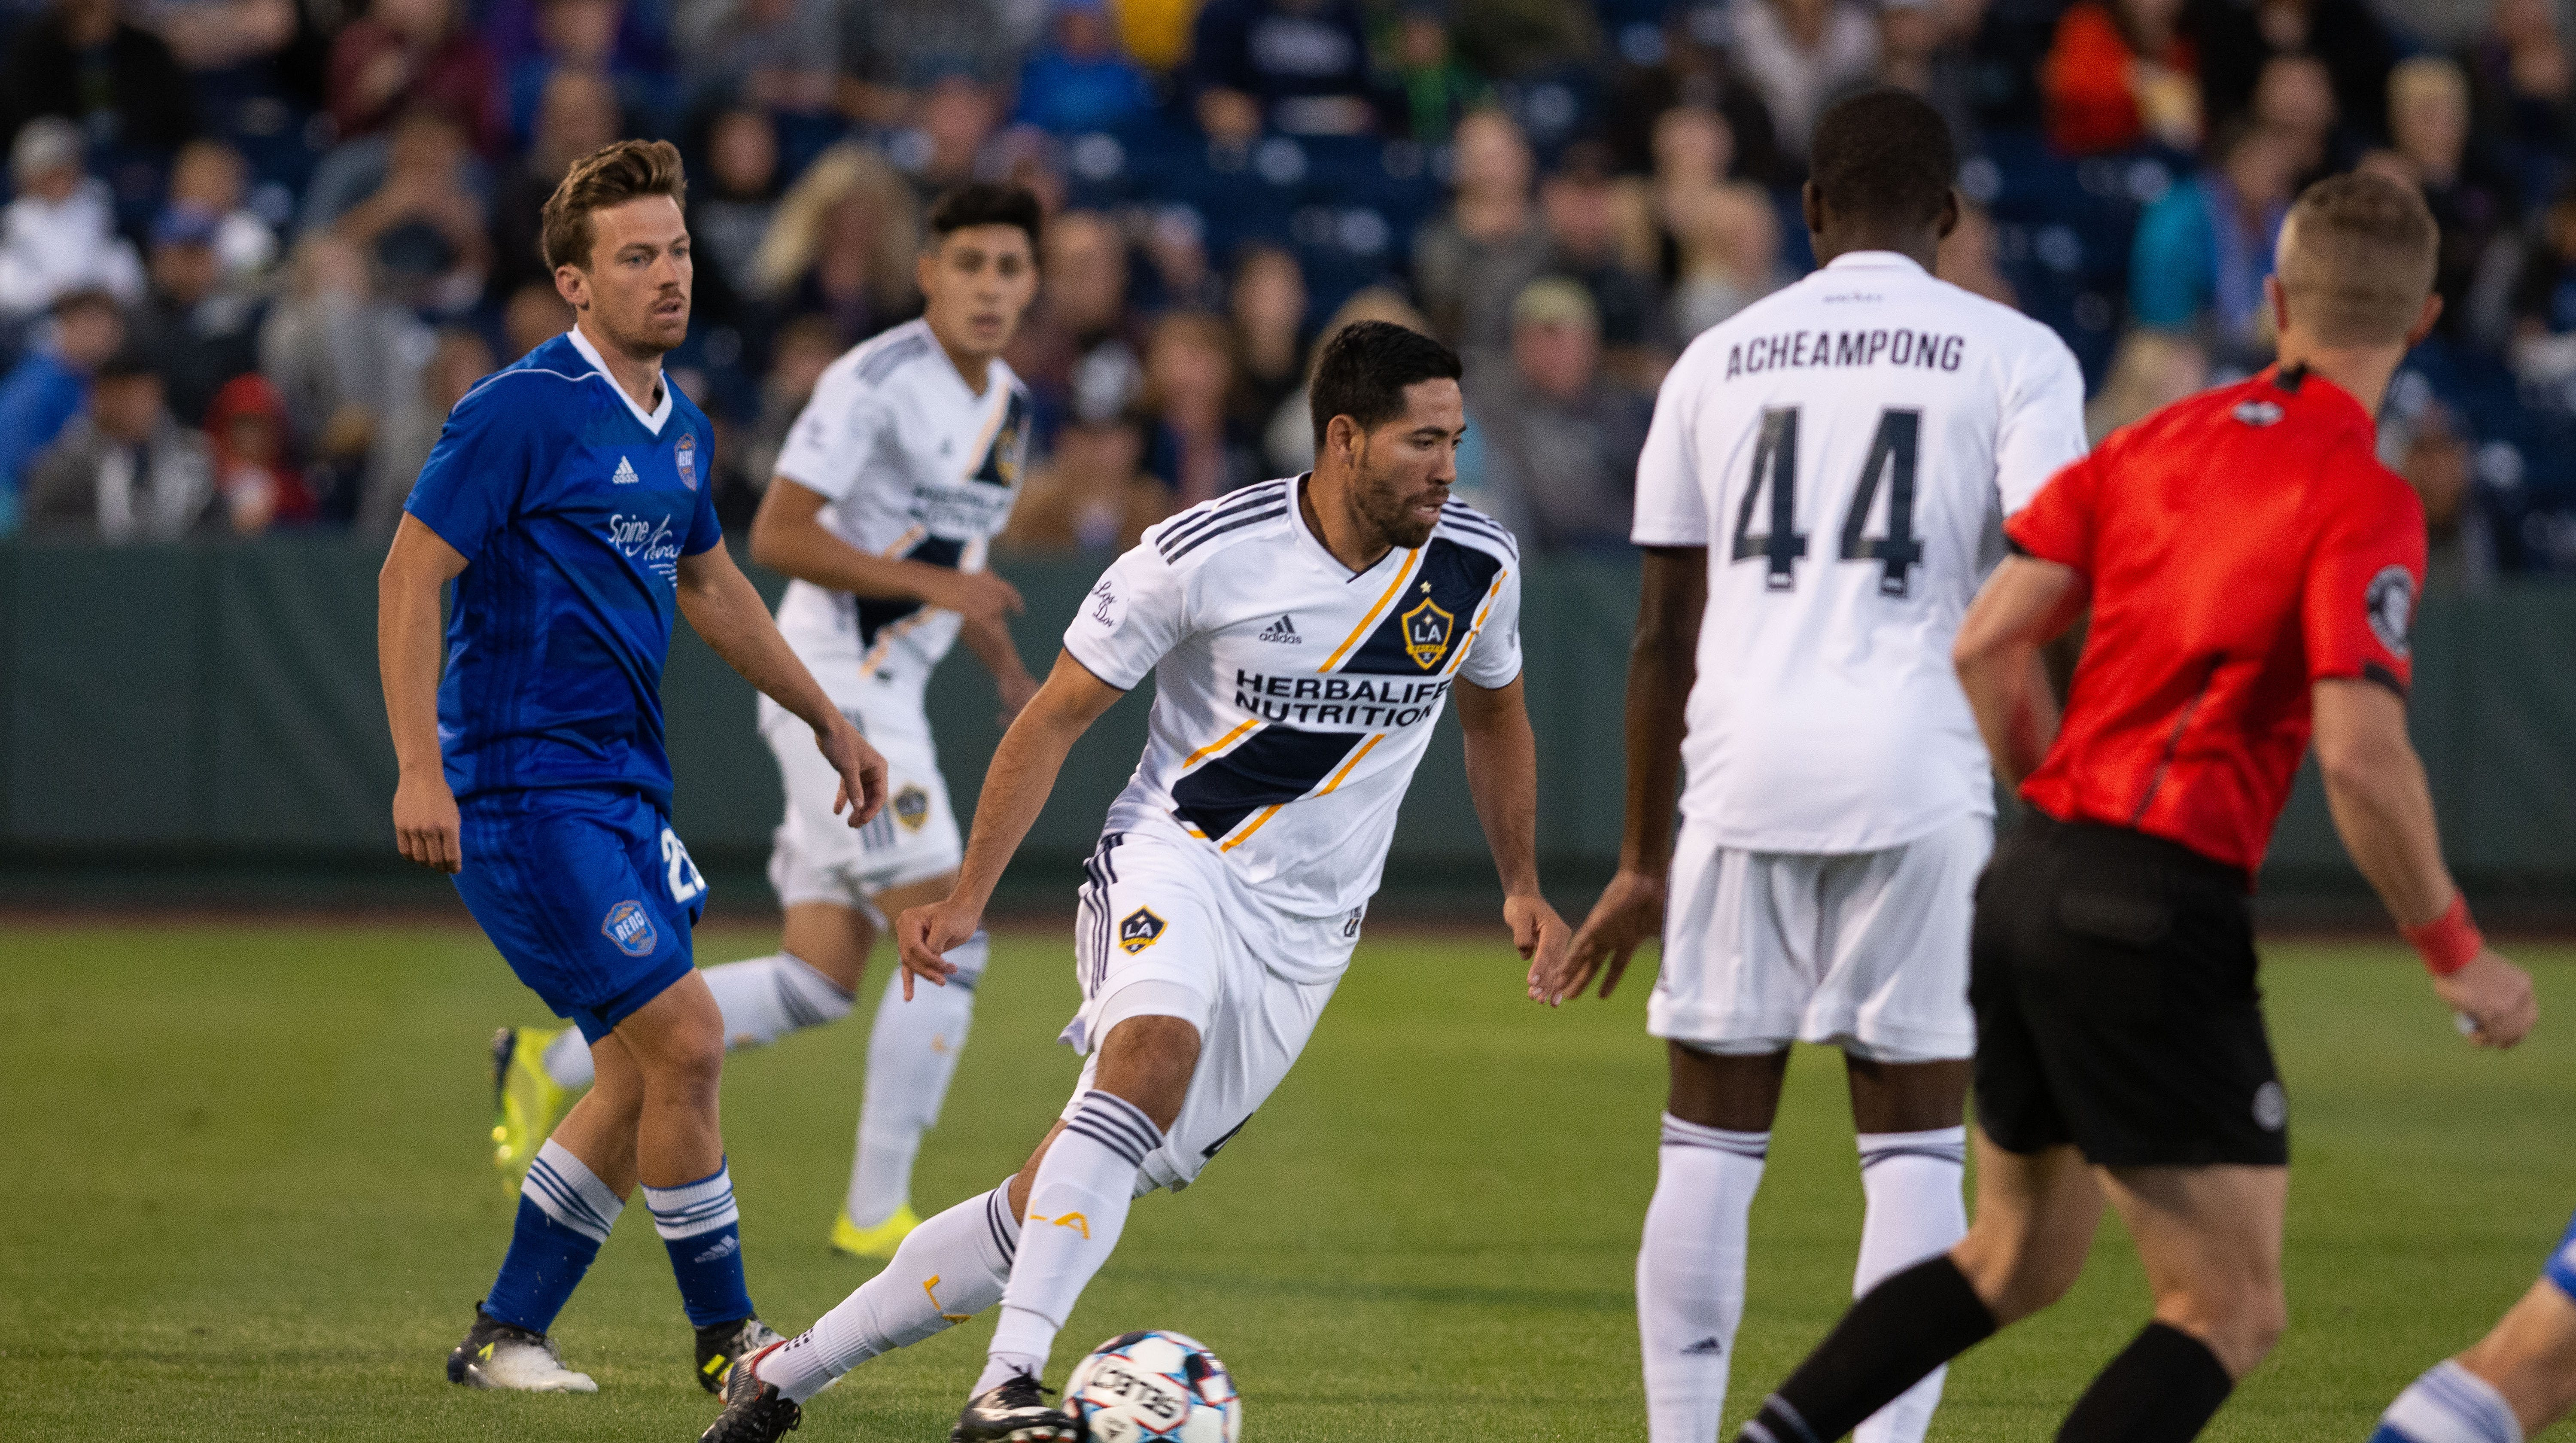 Reno 868 FC takes in LA Galaxy on Saturday night at Greater Nevada Field.